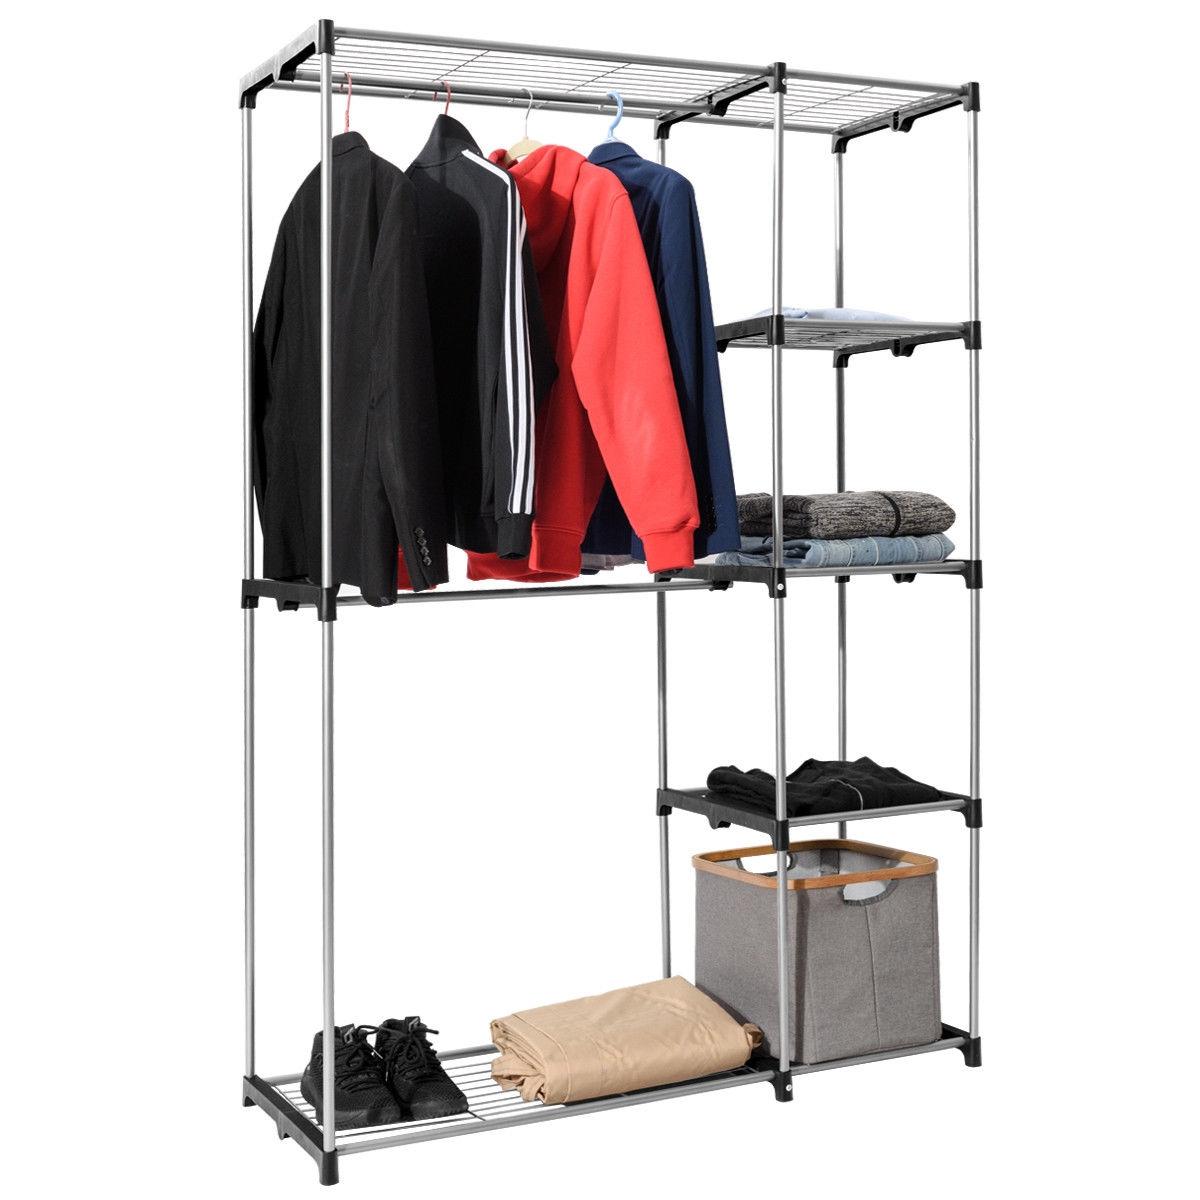 Portable Closet Organizer Garment Rack